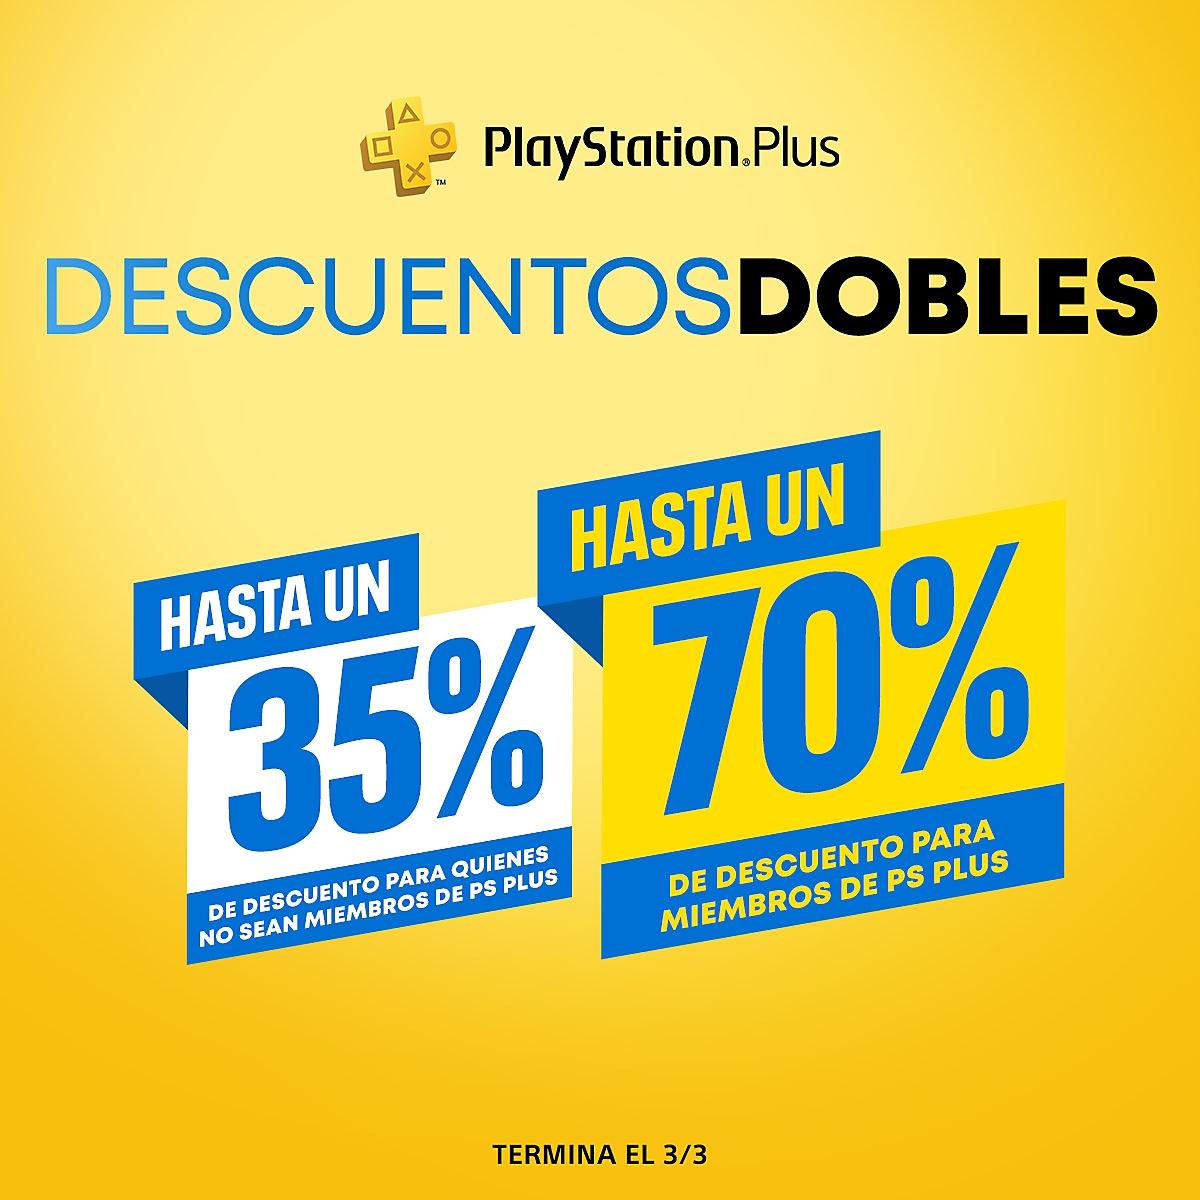 PlayStation Store - Descuentos dobles de PlayStation Plus